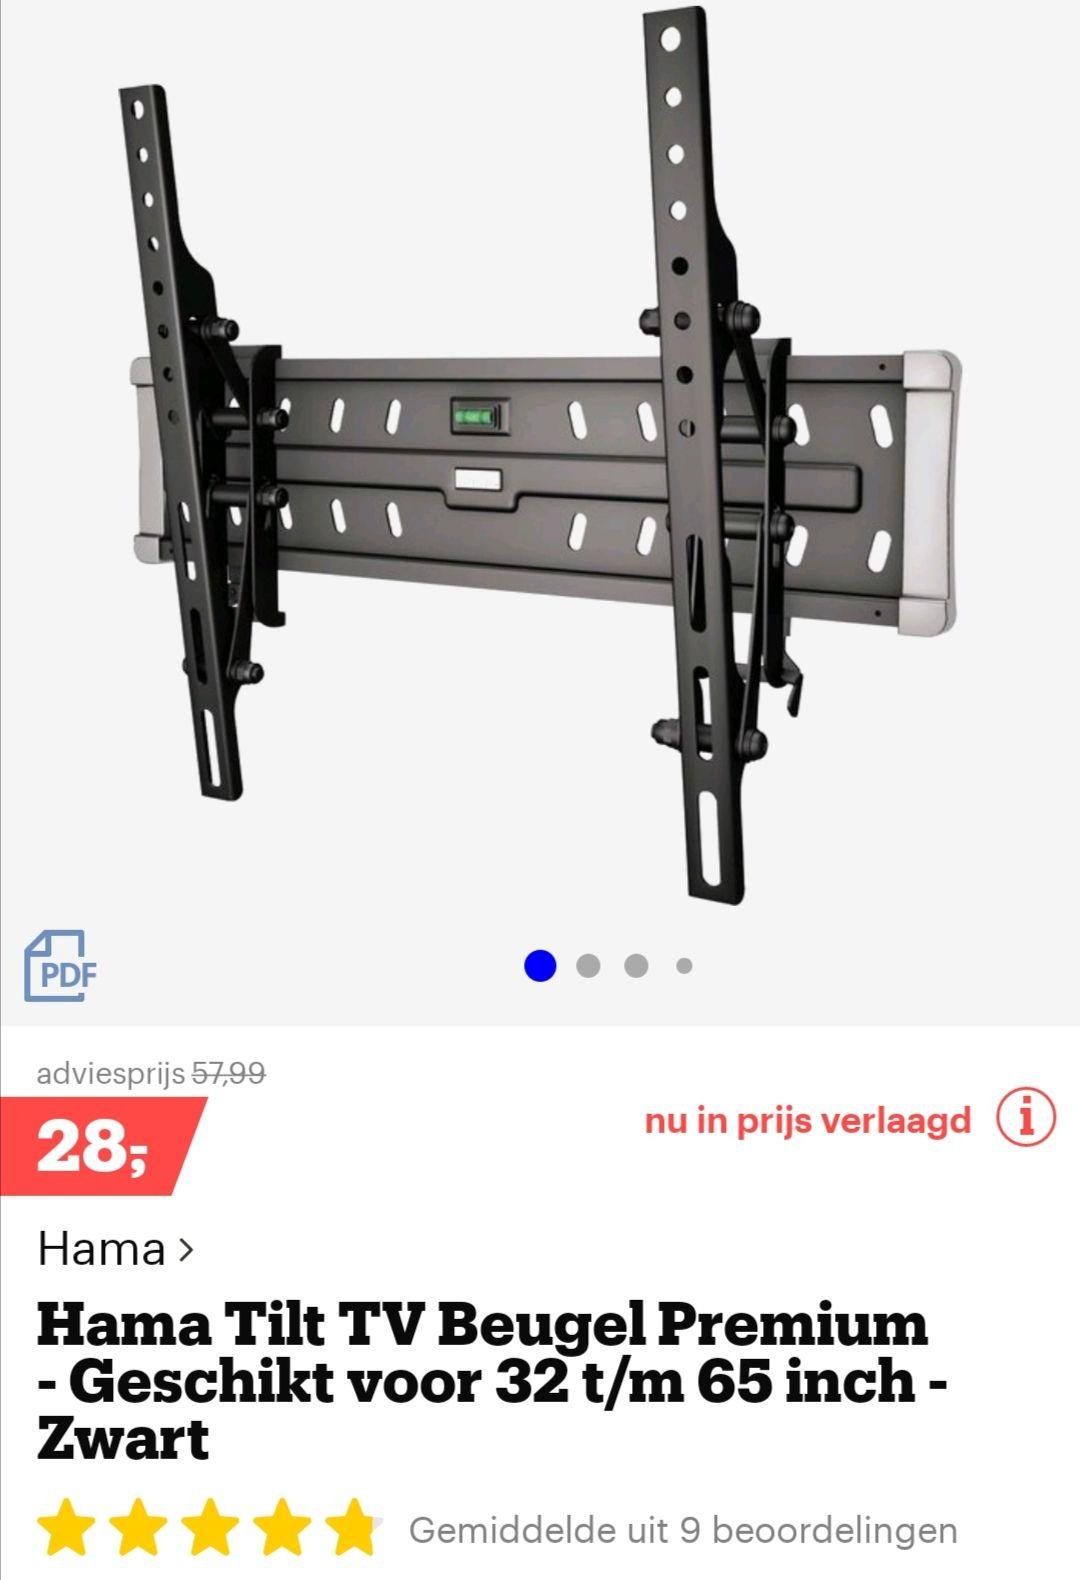 Hama Tilt TV beugel Premium